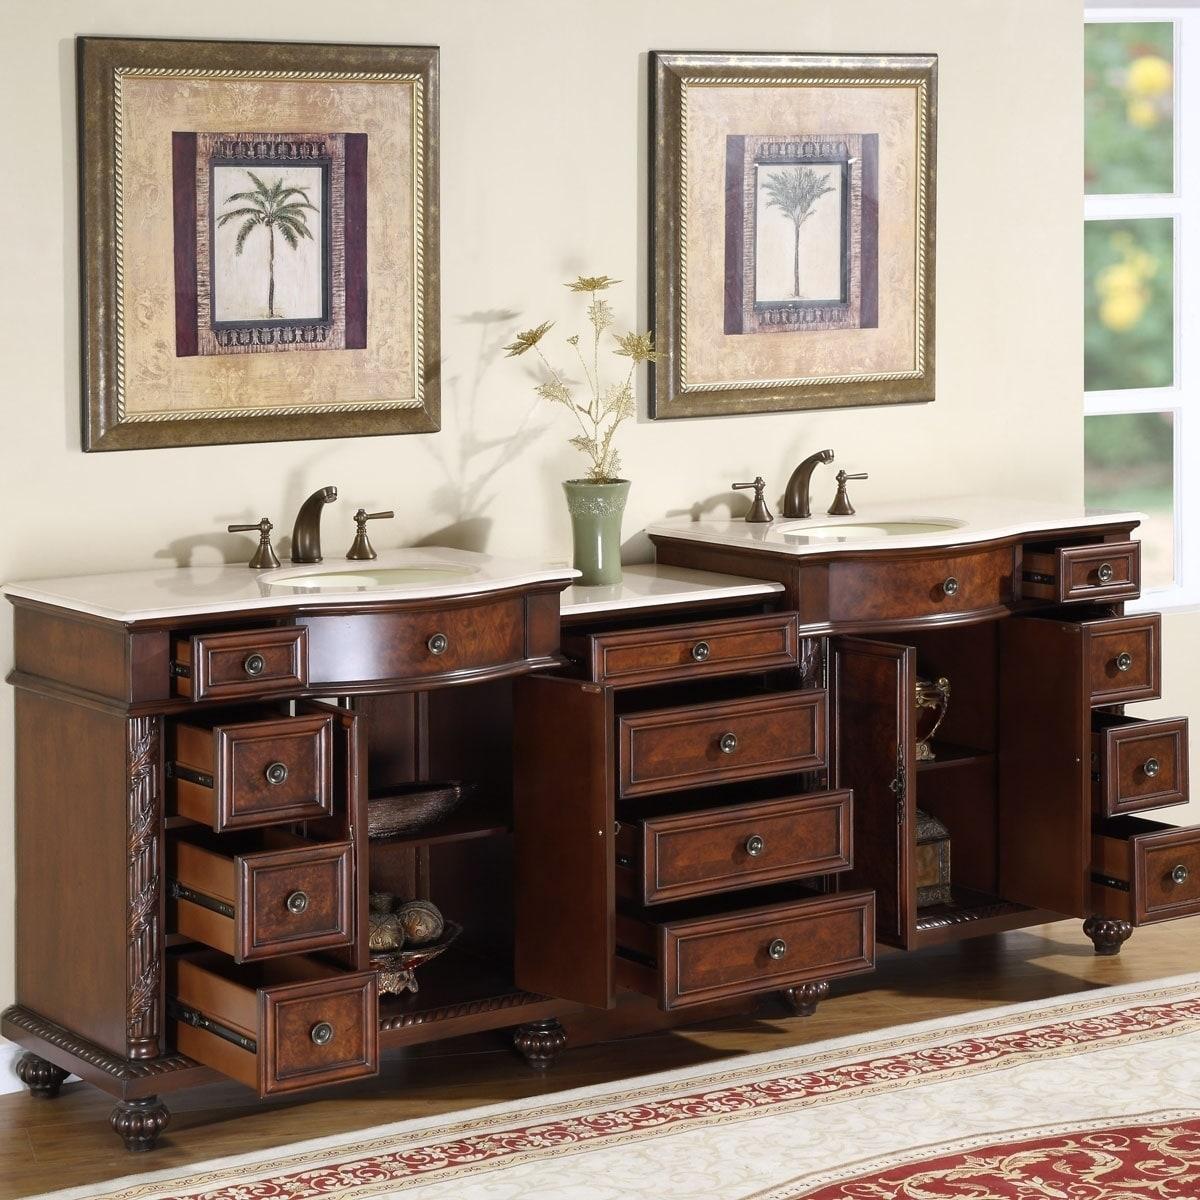 Shop Silkroad Exclusive English Chestnut Inch Stone Top Double - 90 inch bathroom vanity